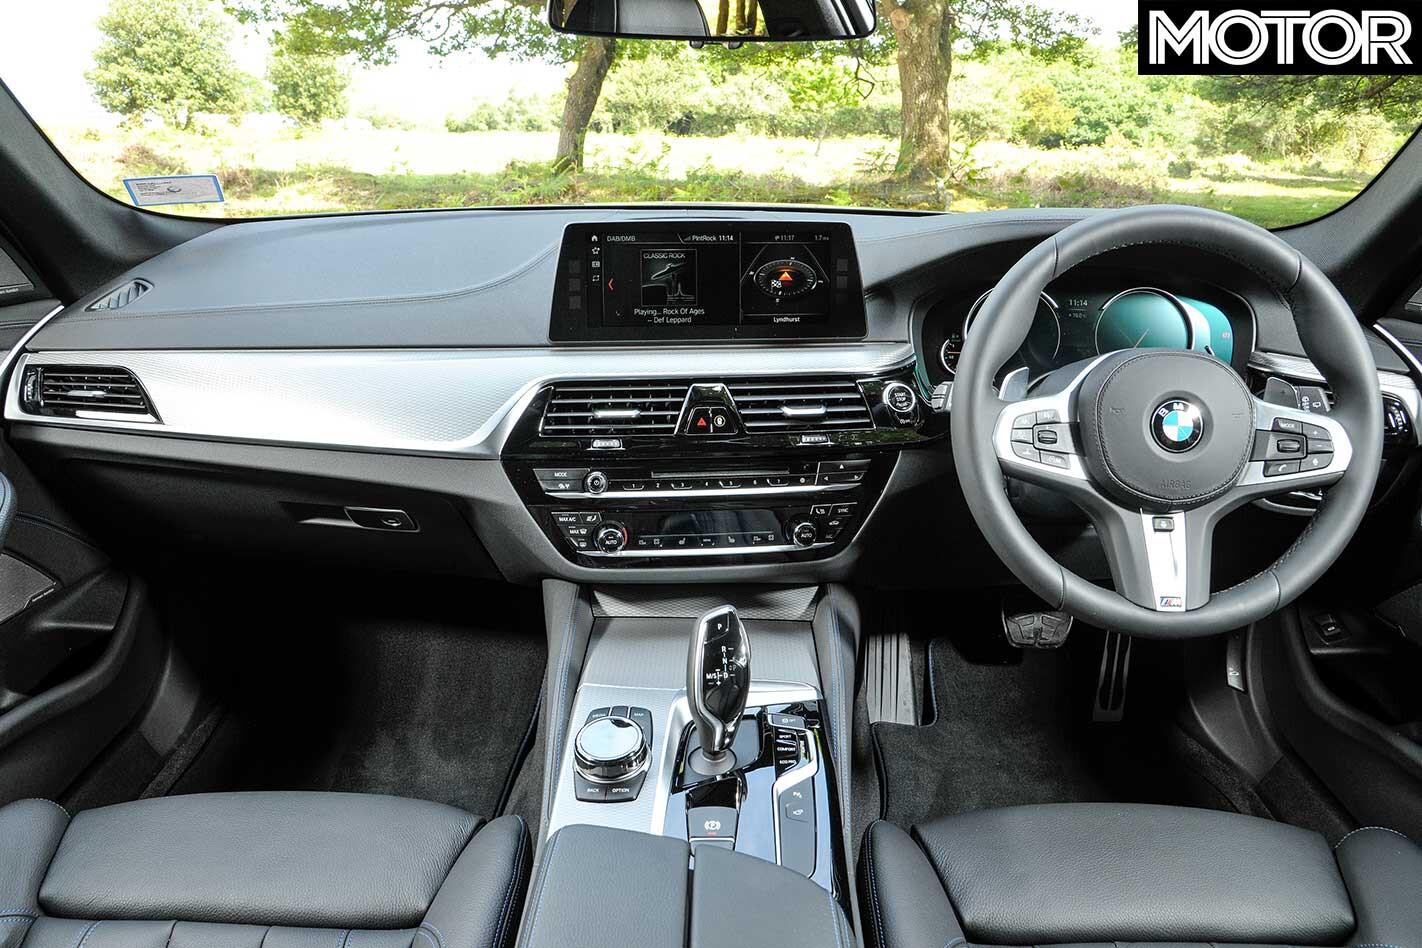 2018 BMW 530 I Touring Interior Jpg